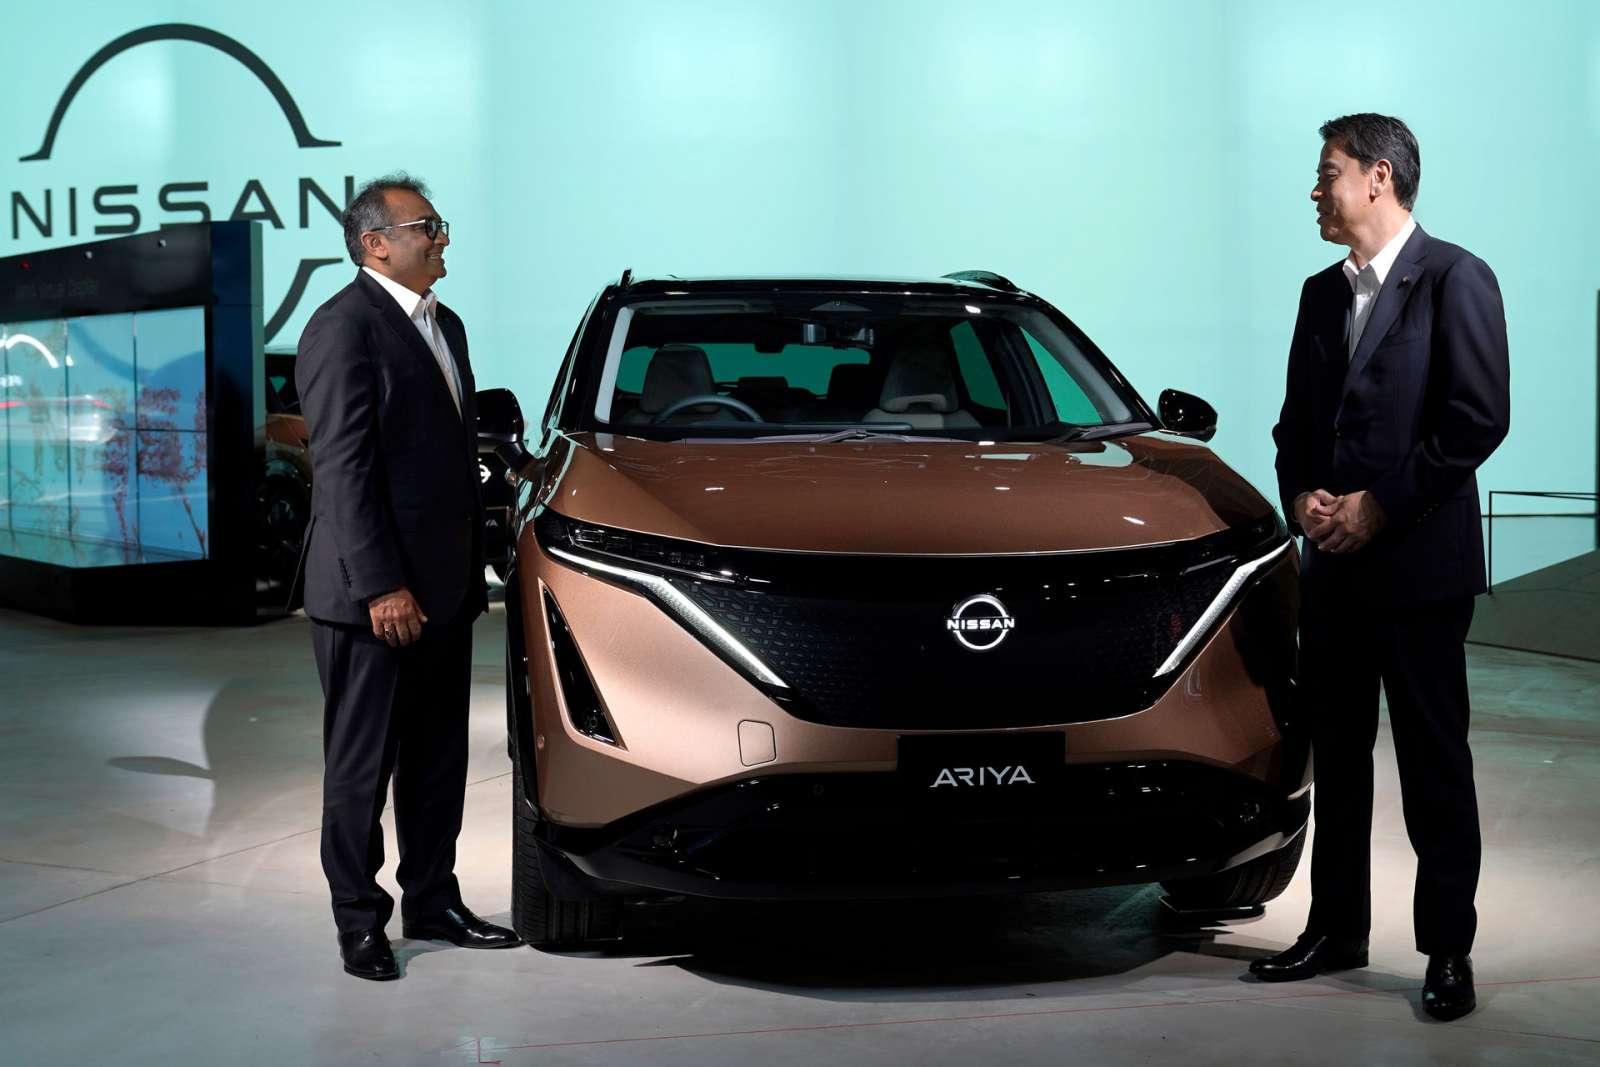 Nissan Ariya 2020 électrique SUV